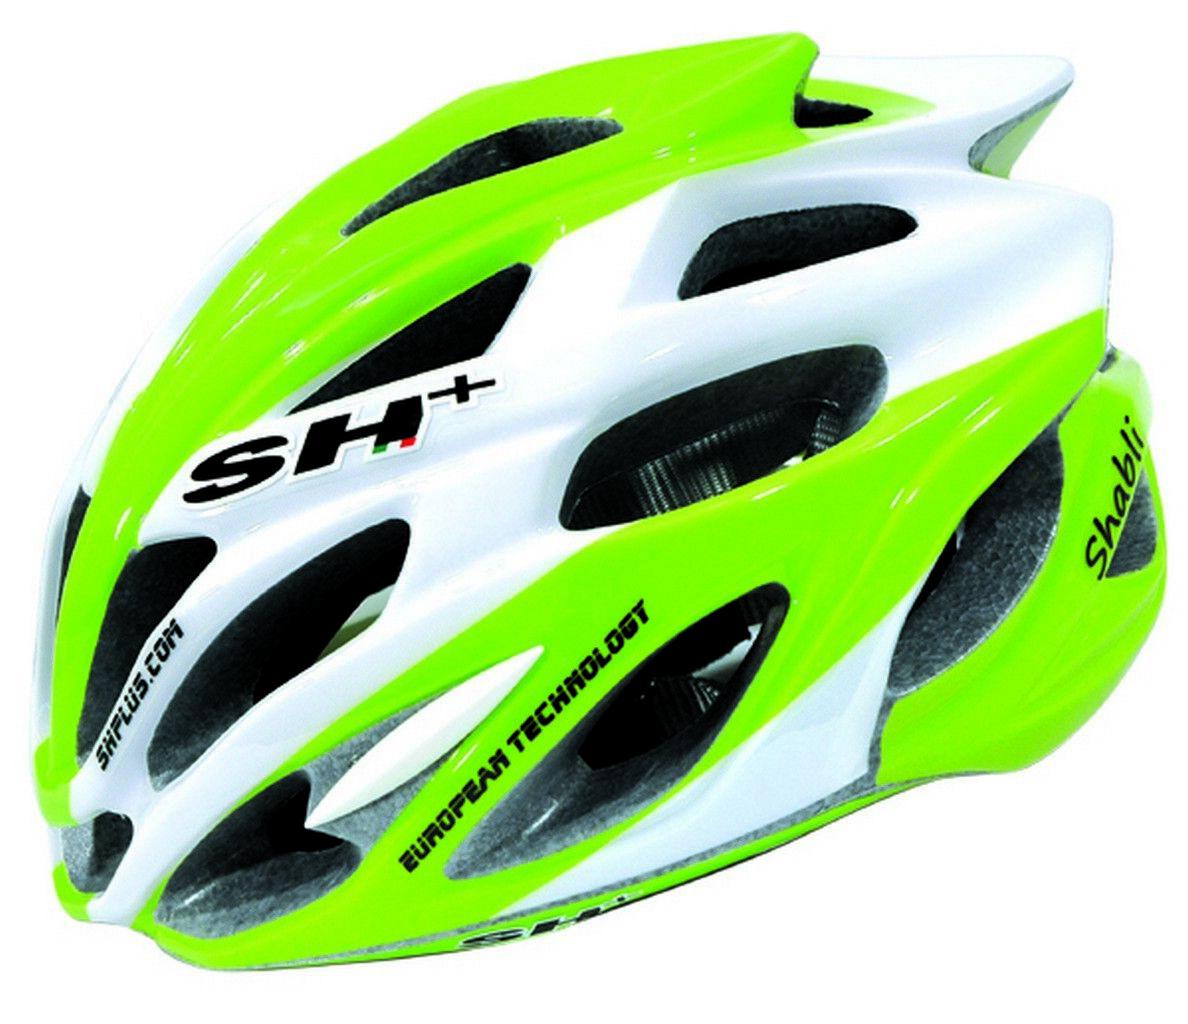 SH+ (SH Plus)  Shabli Cycling Bicycle Helmet - Green   White  (Was  199.99)  at cheap